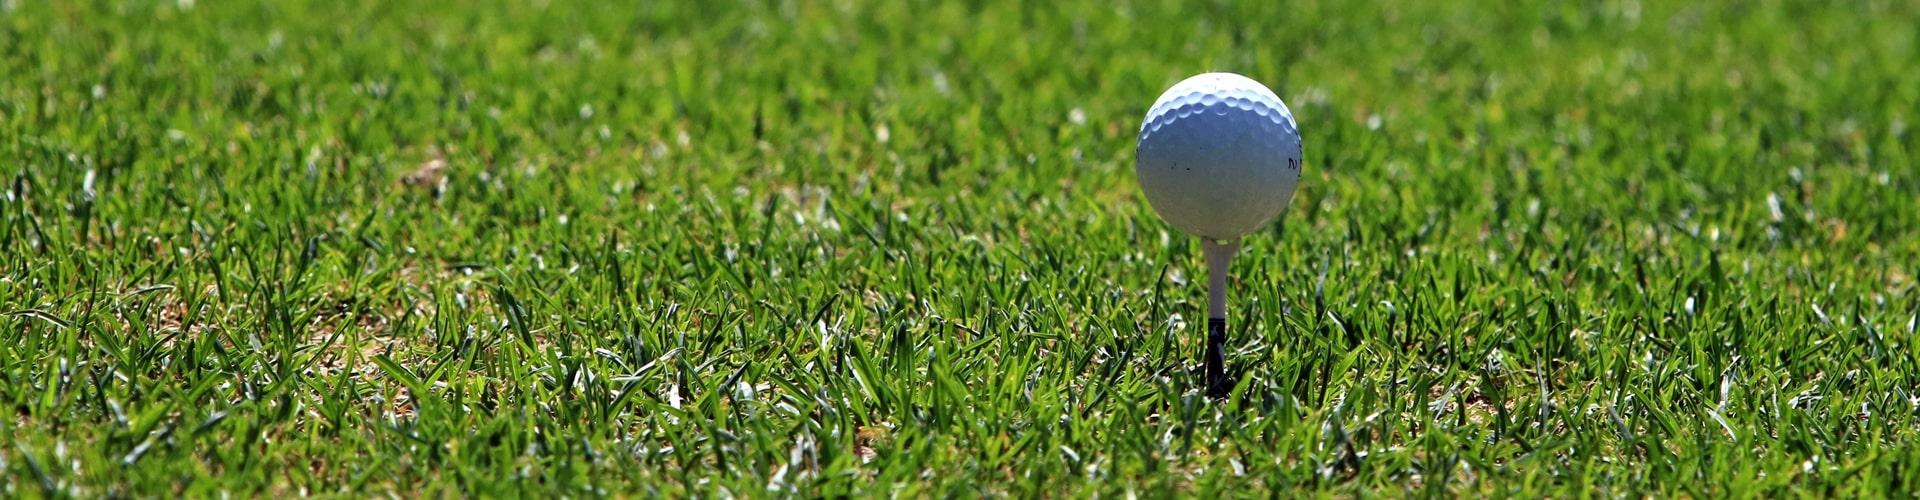 Golfball im Rasen